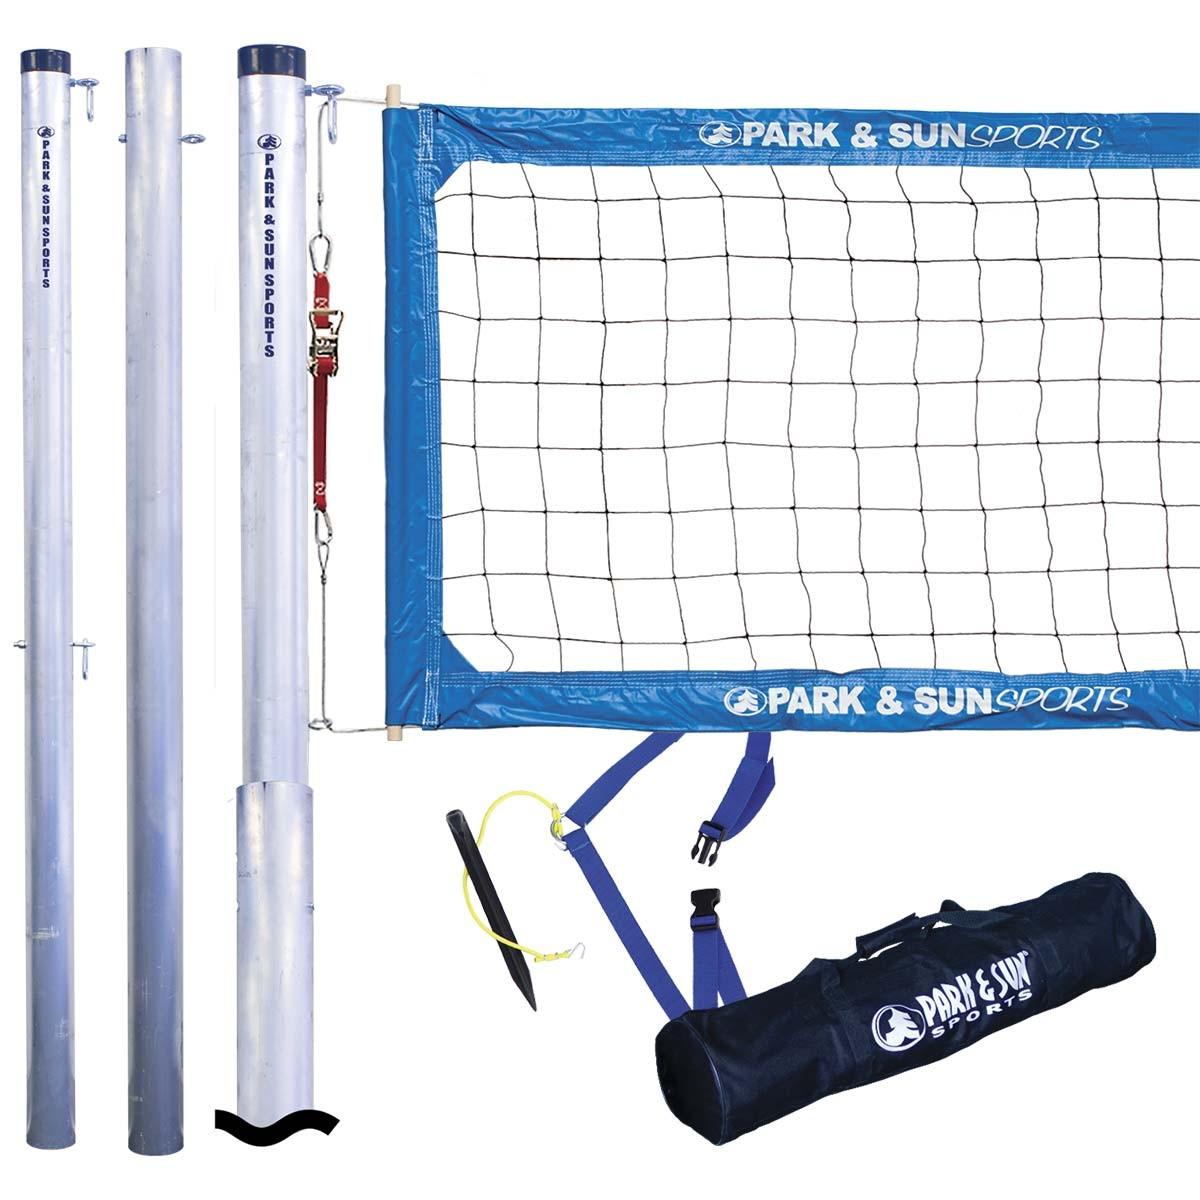 Park Amp Sun 4000t Tournament Outdoor Volleyball Net System